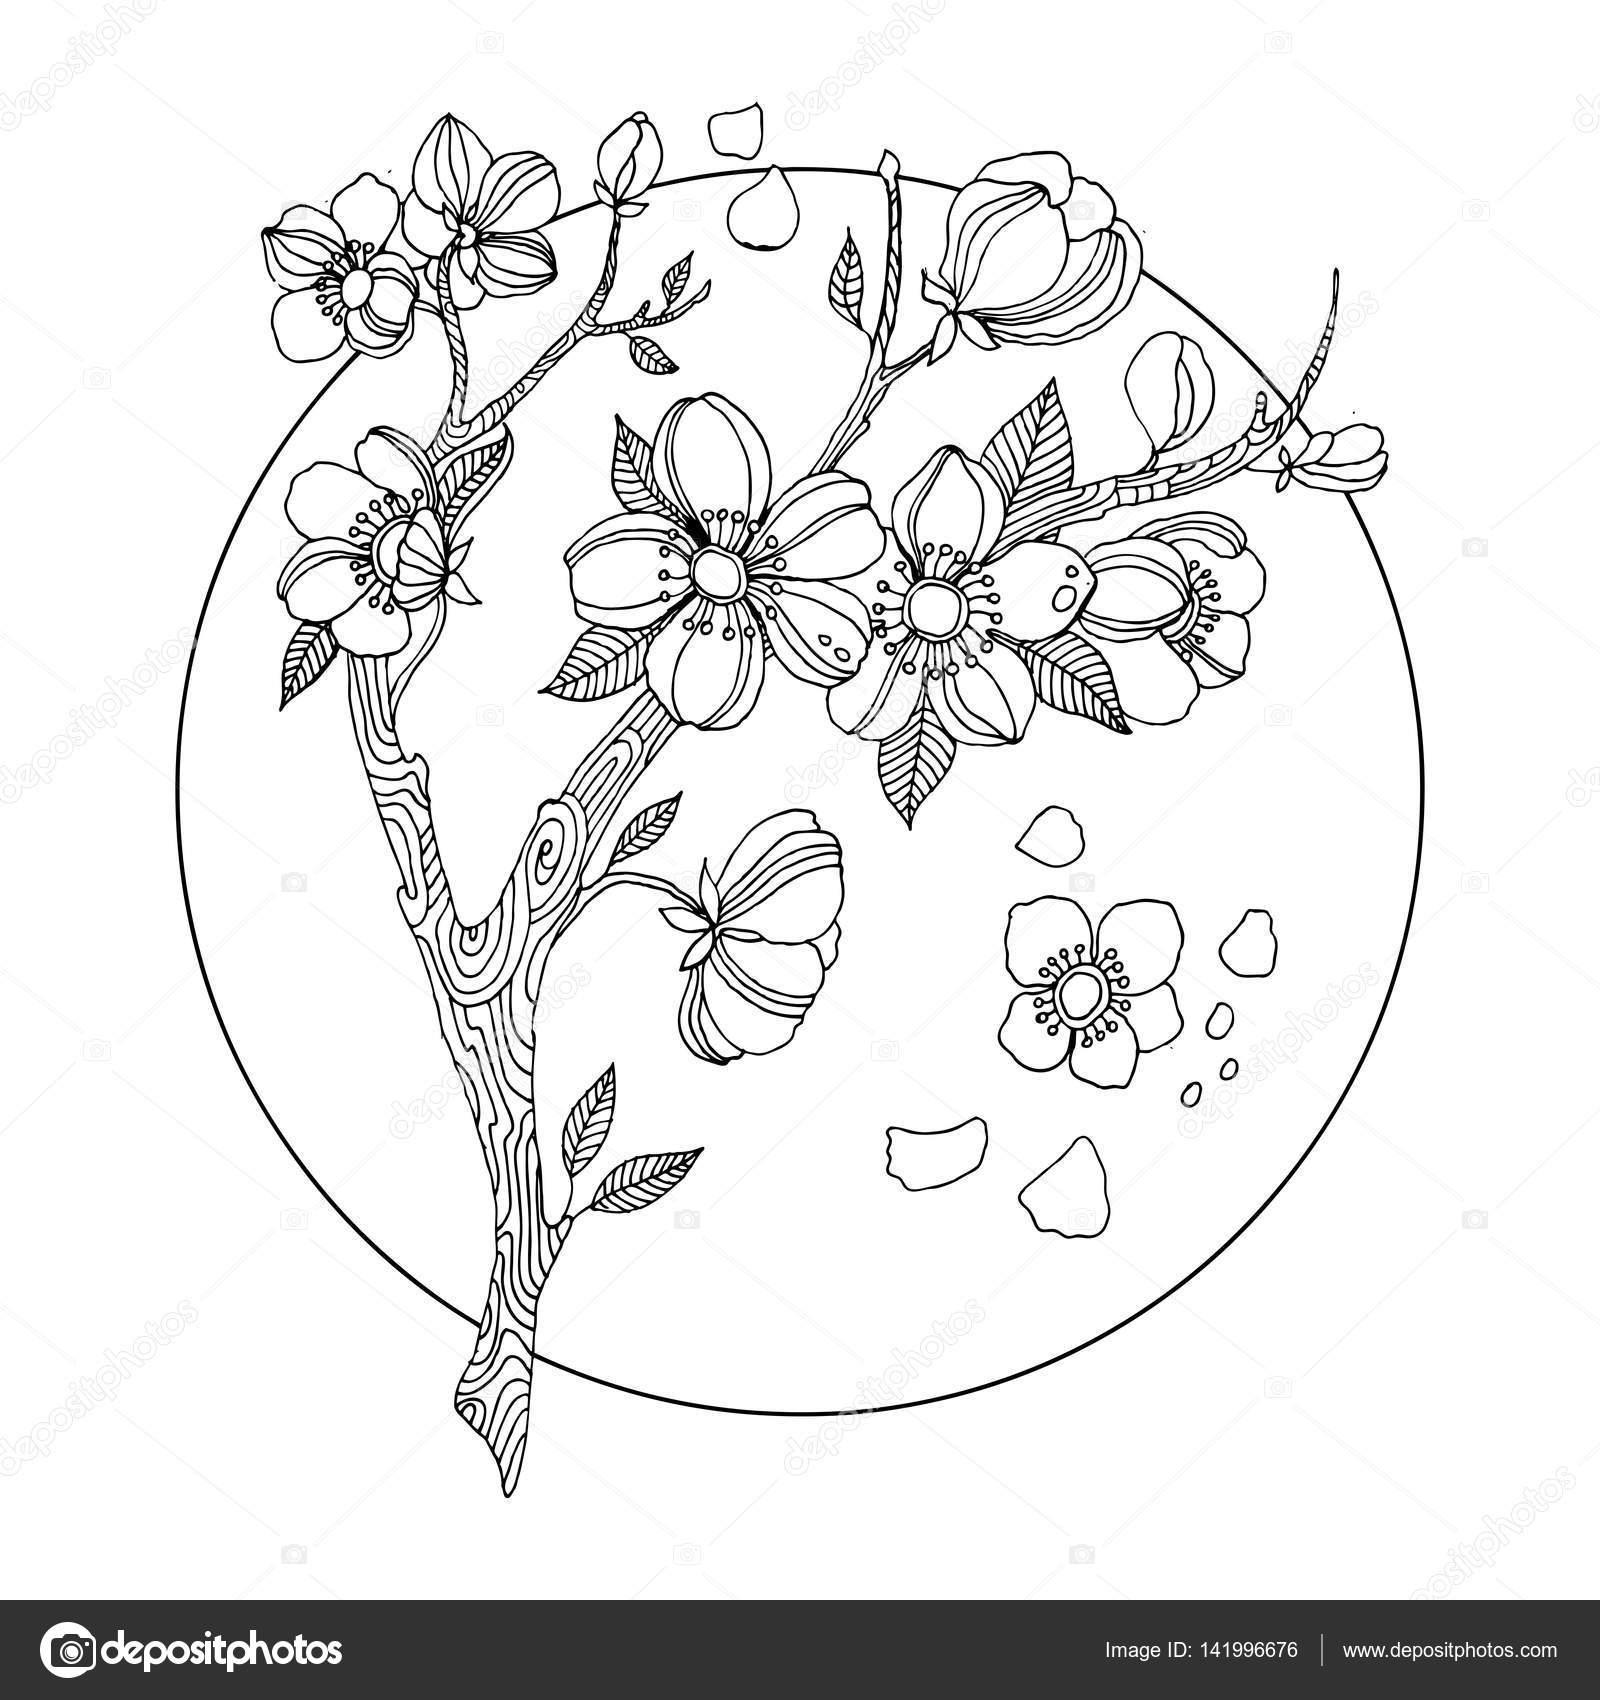 Coloriage Cerisier - OHBQ.info